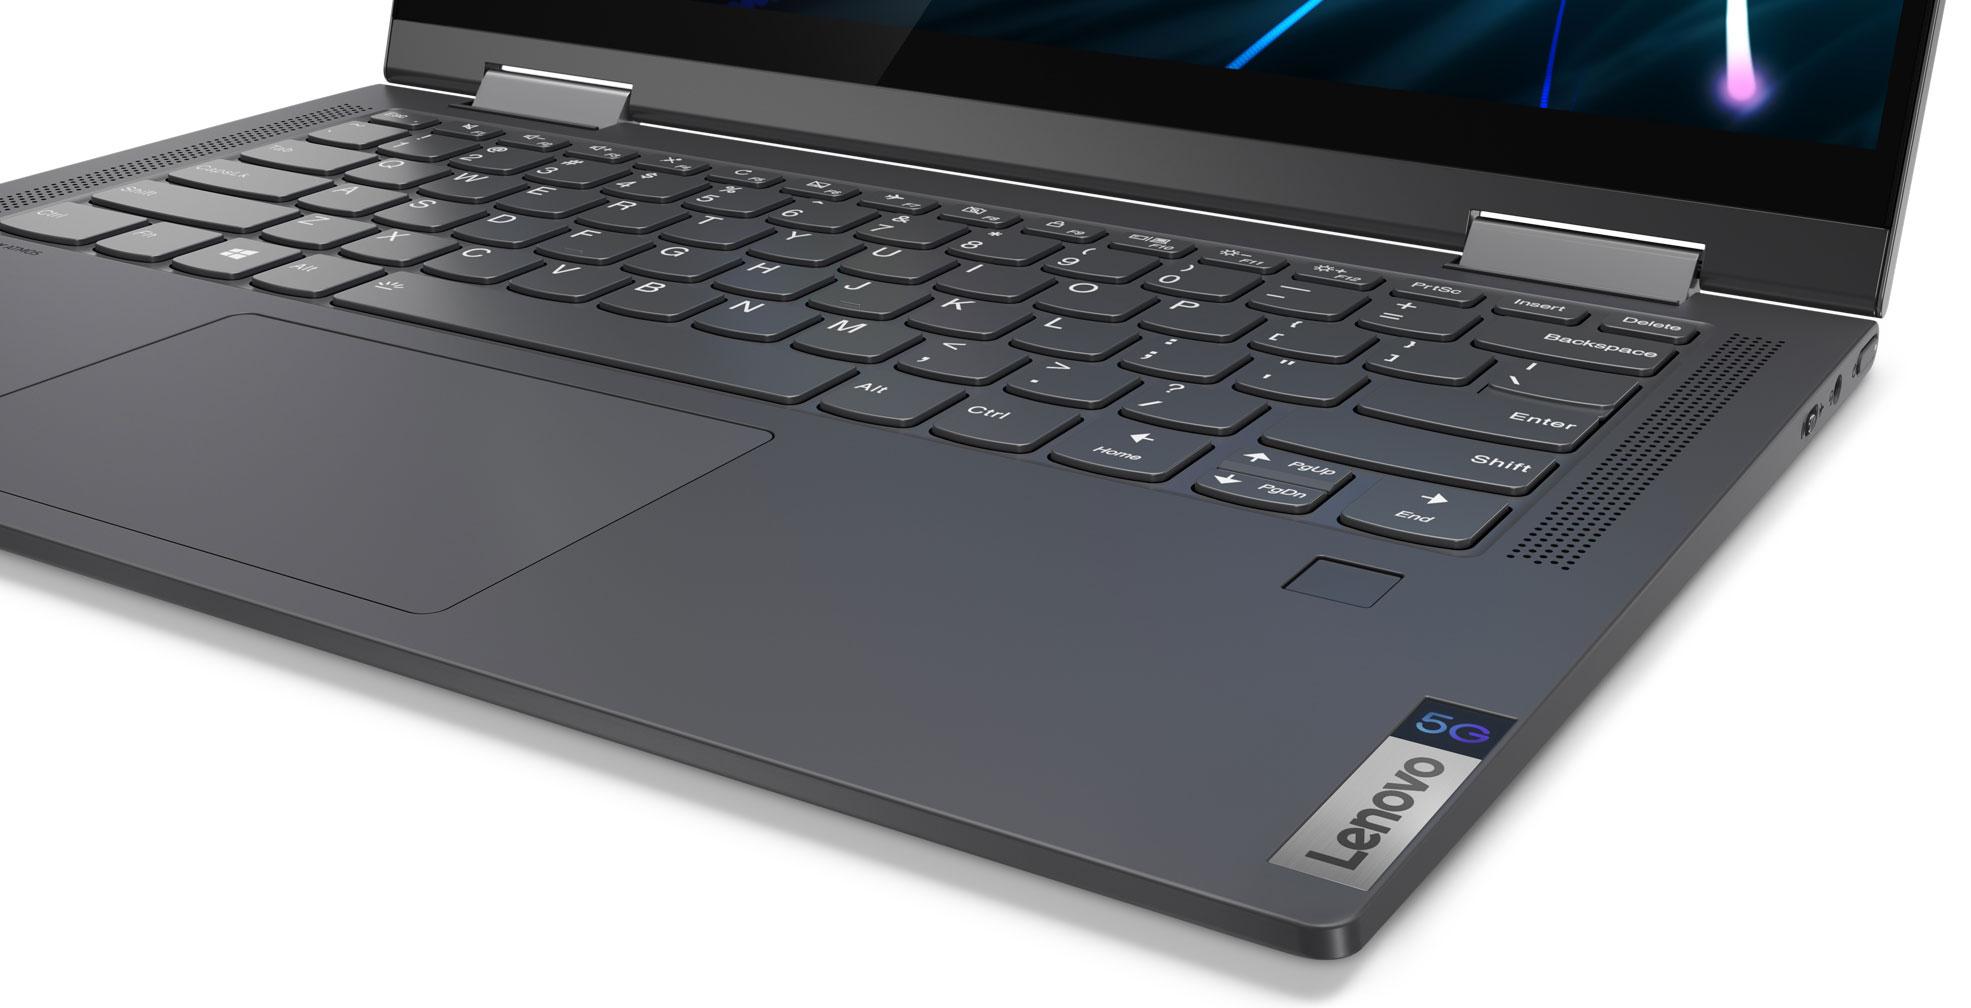 Lenovo Yoga 5G, or Flex 5G in the US